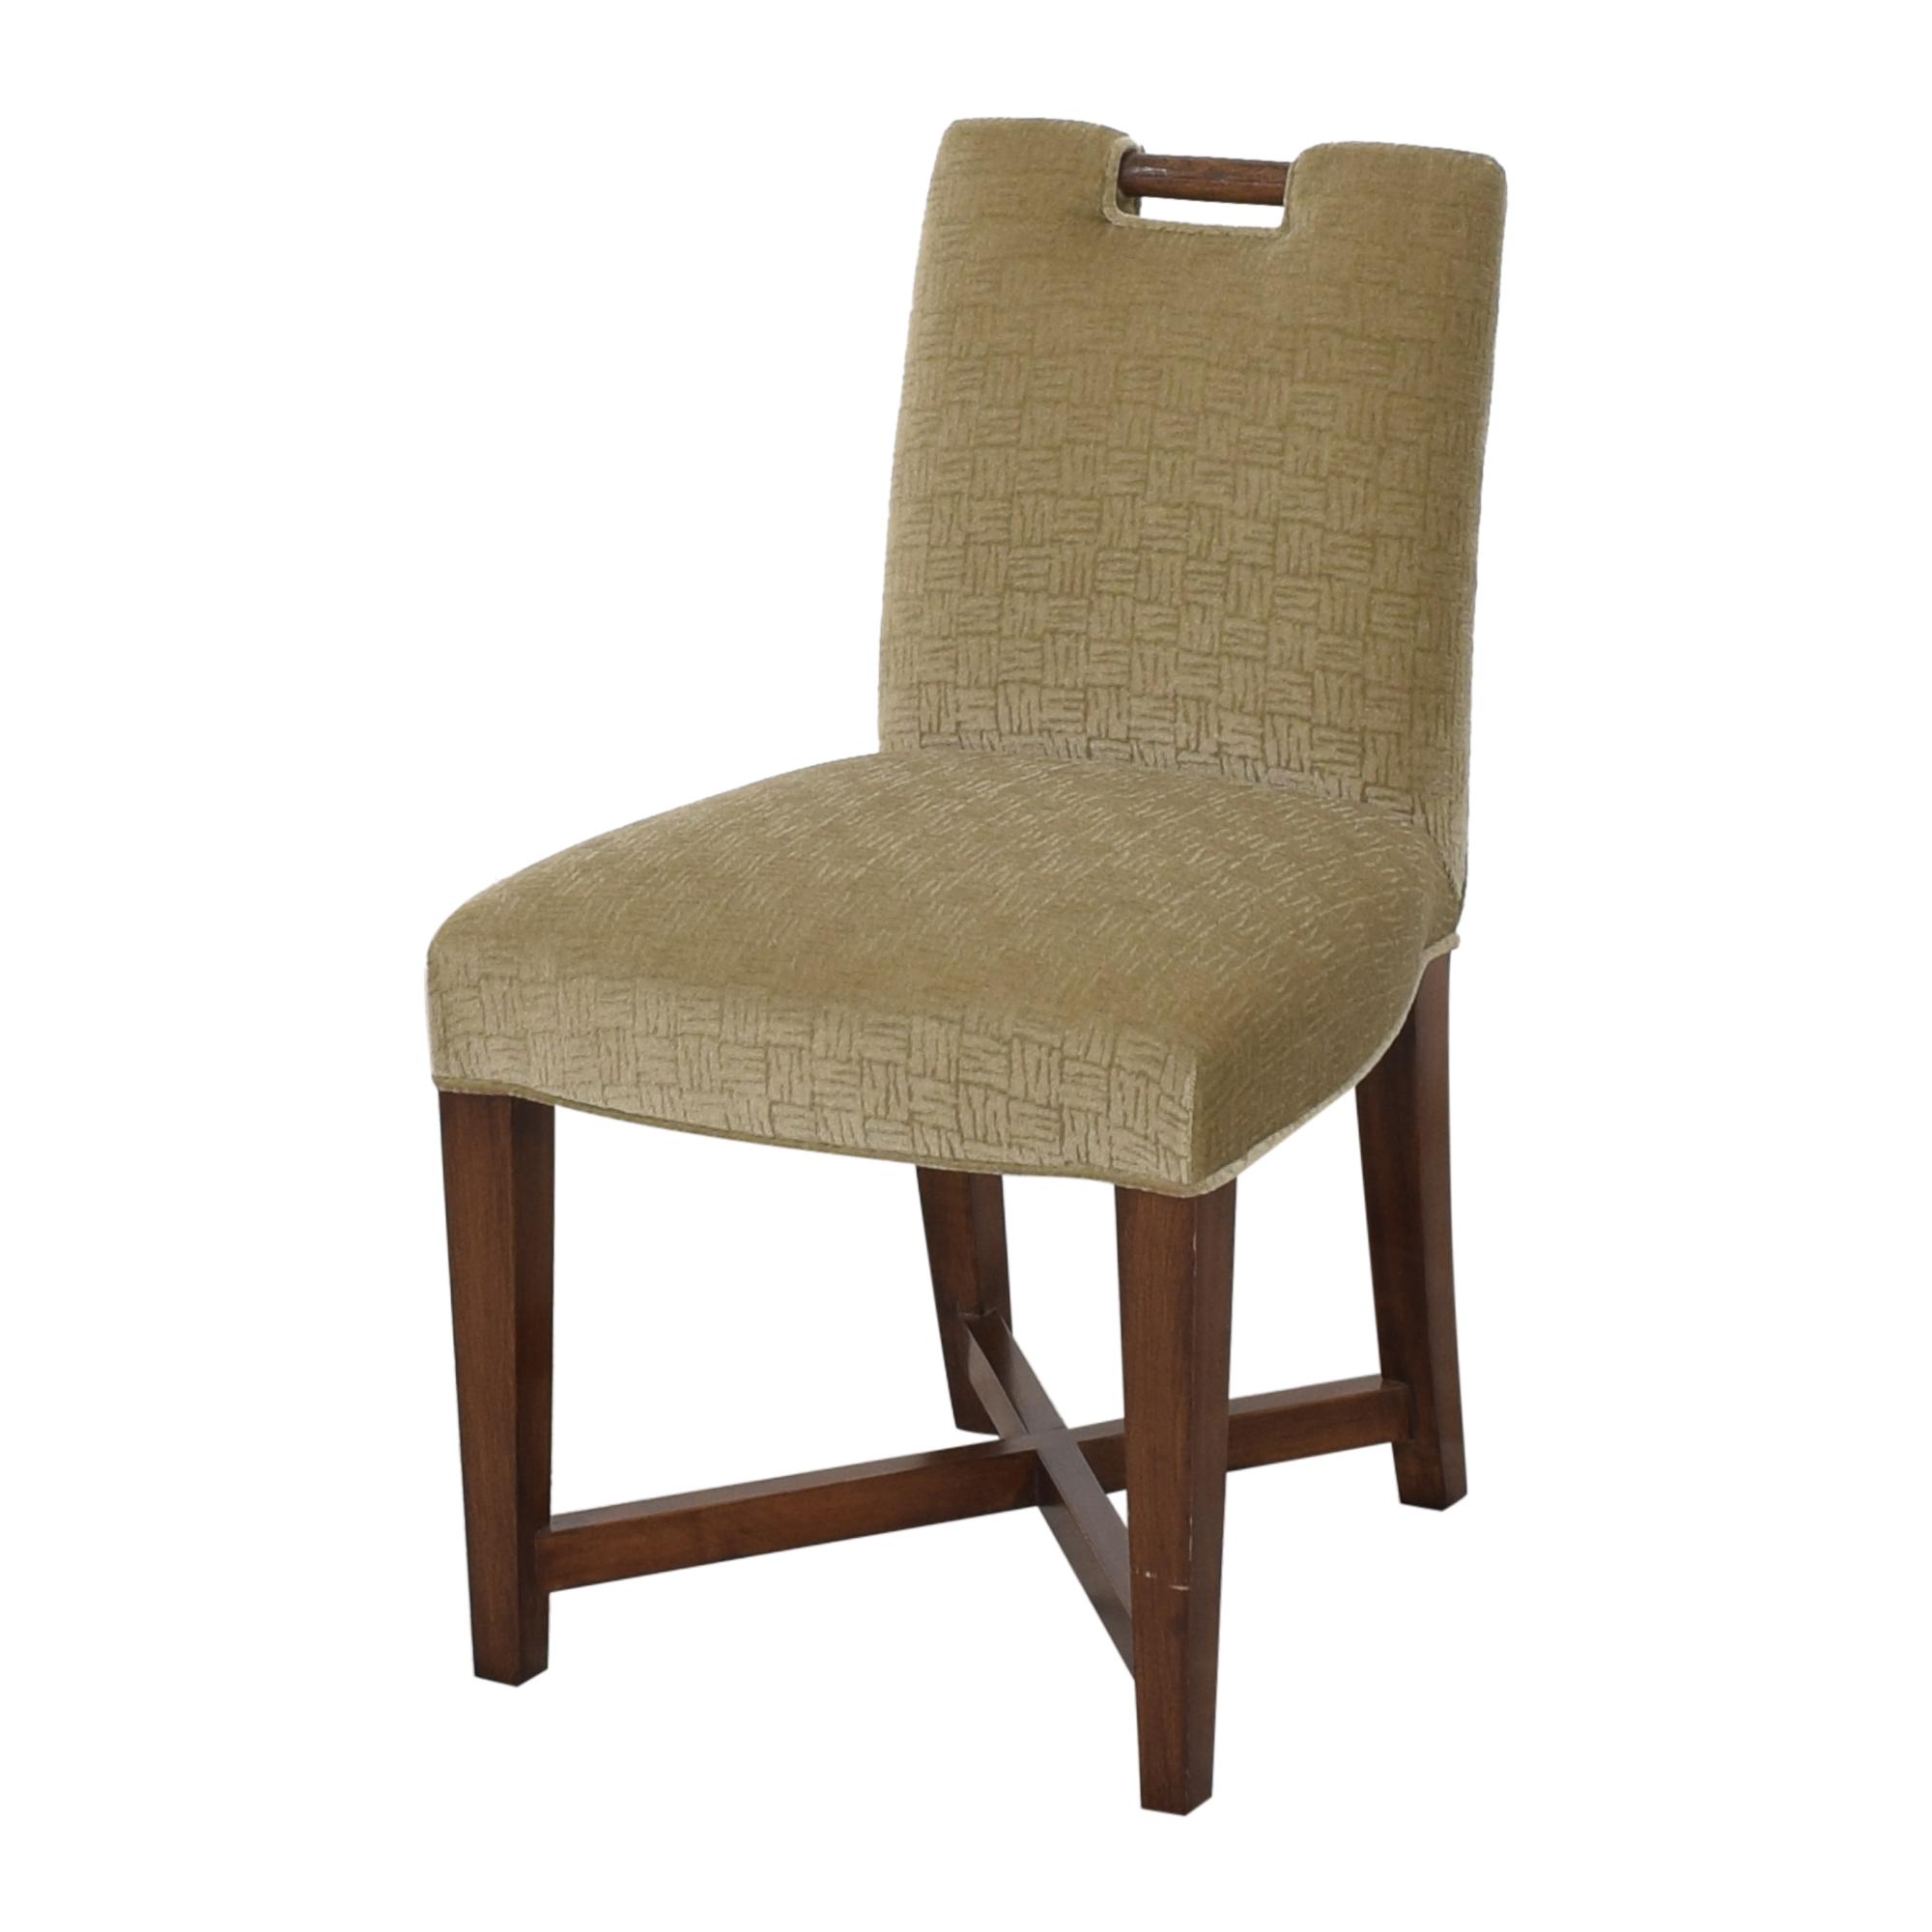 Donghia Donghia Custom Upholstered Chair